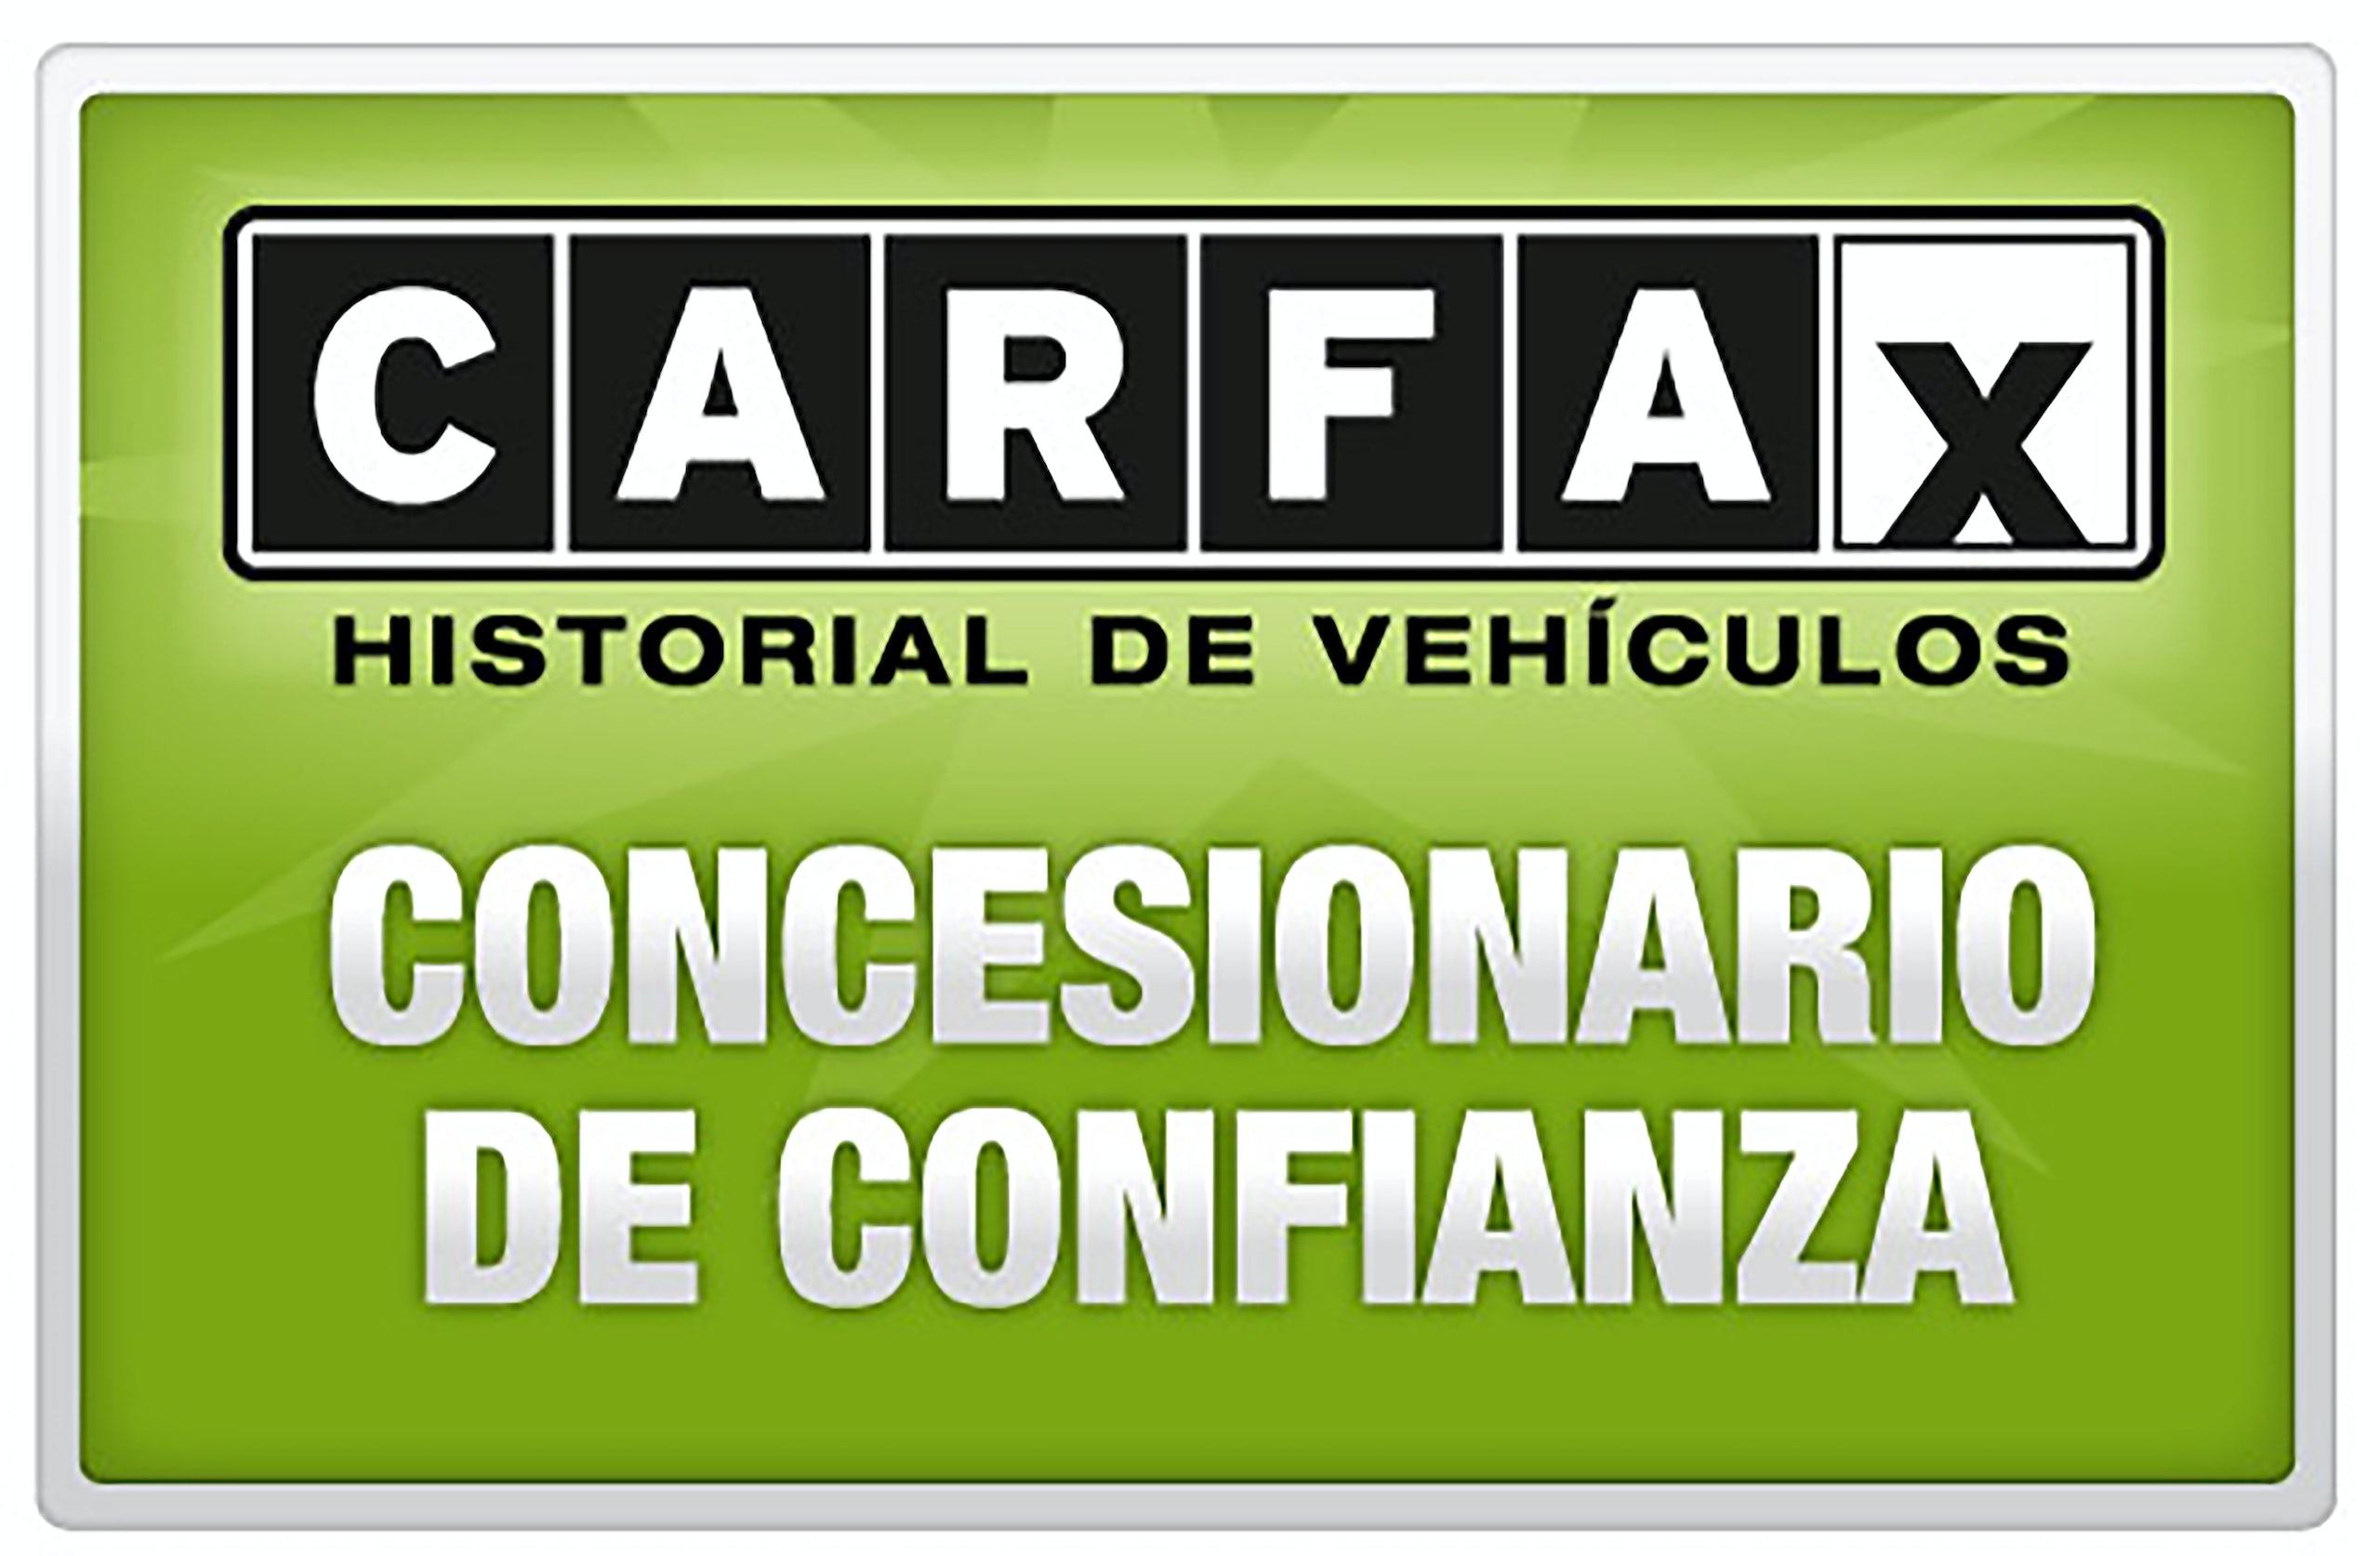 Fiat Fiorino Cargo 1.3 16v Multijet 75cv Base 4p